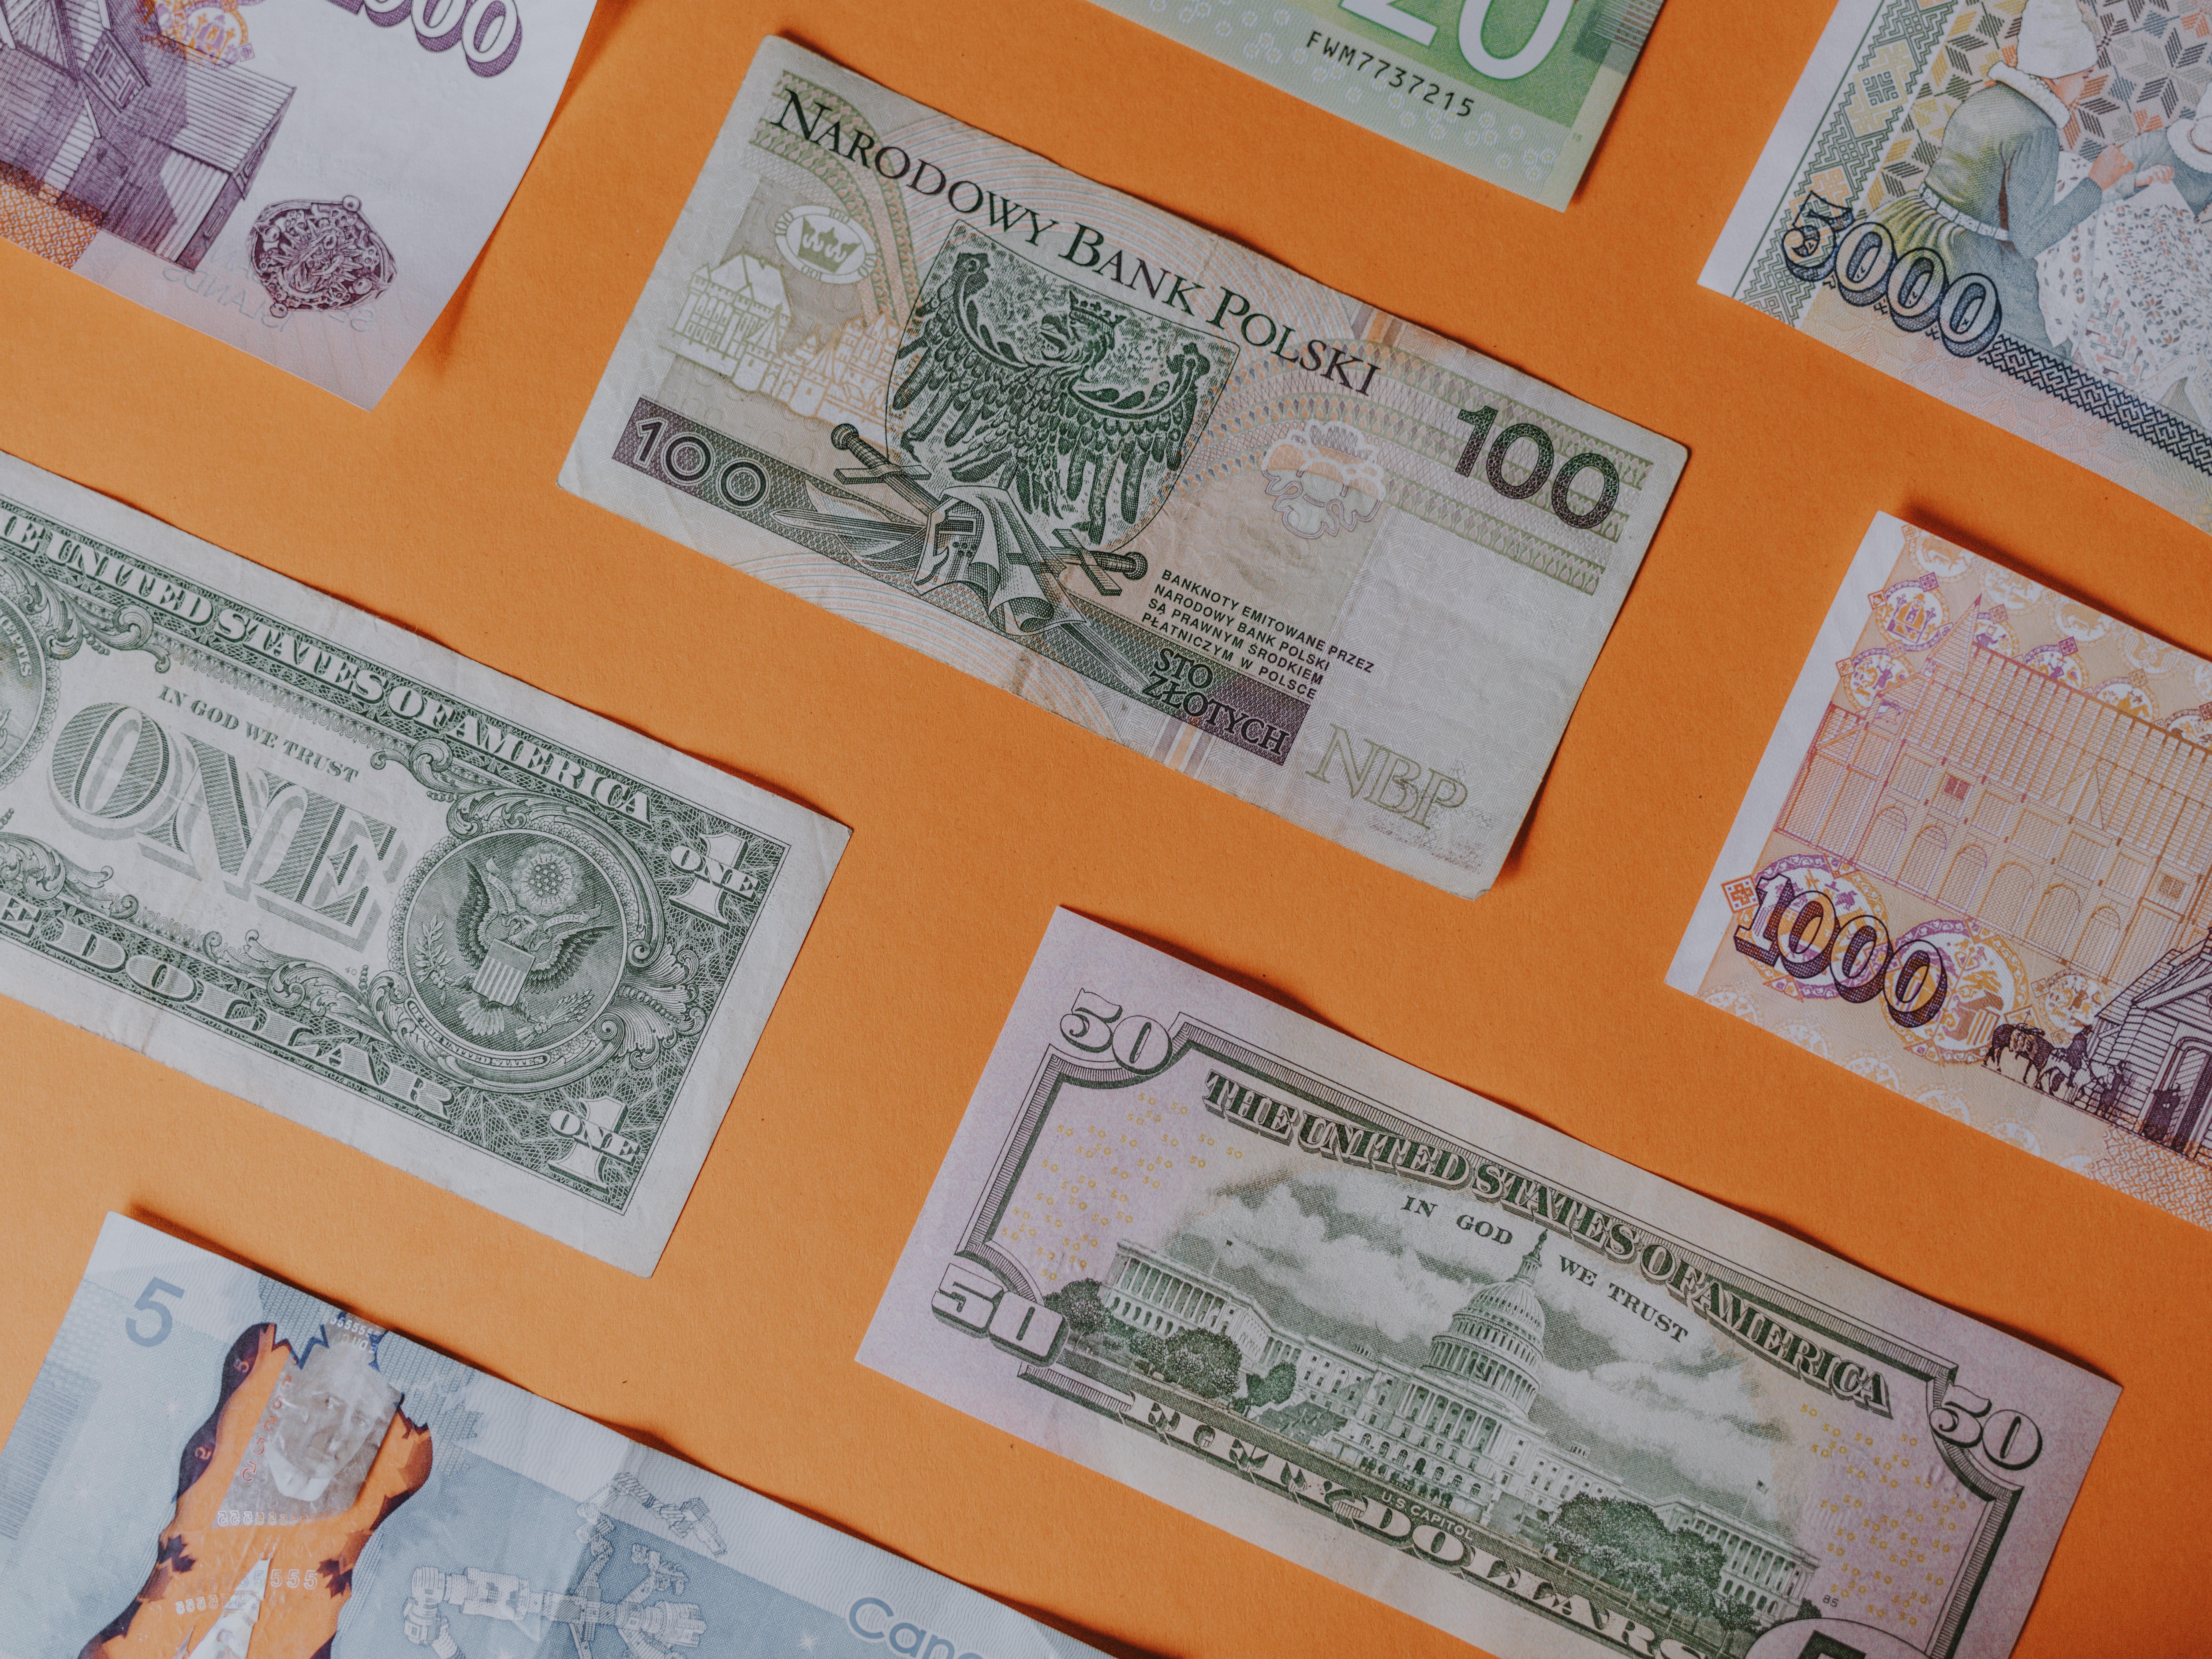 Photo of money from around the world with orange background